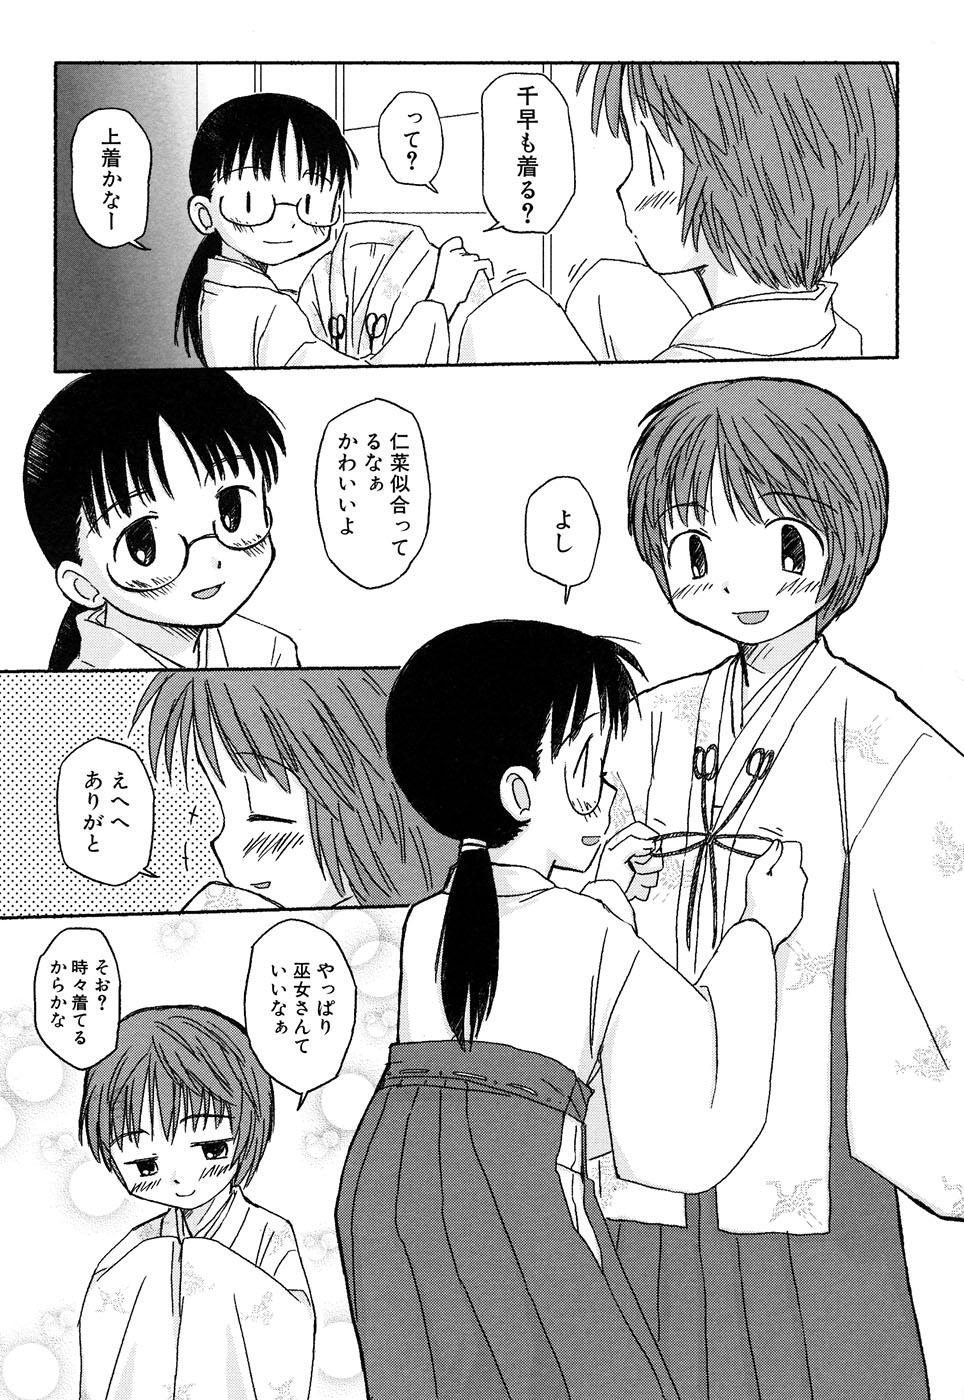 Fechikko VS Series ROUND.2 Miko San VS Maid San 61